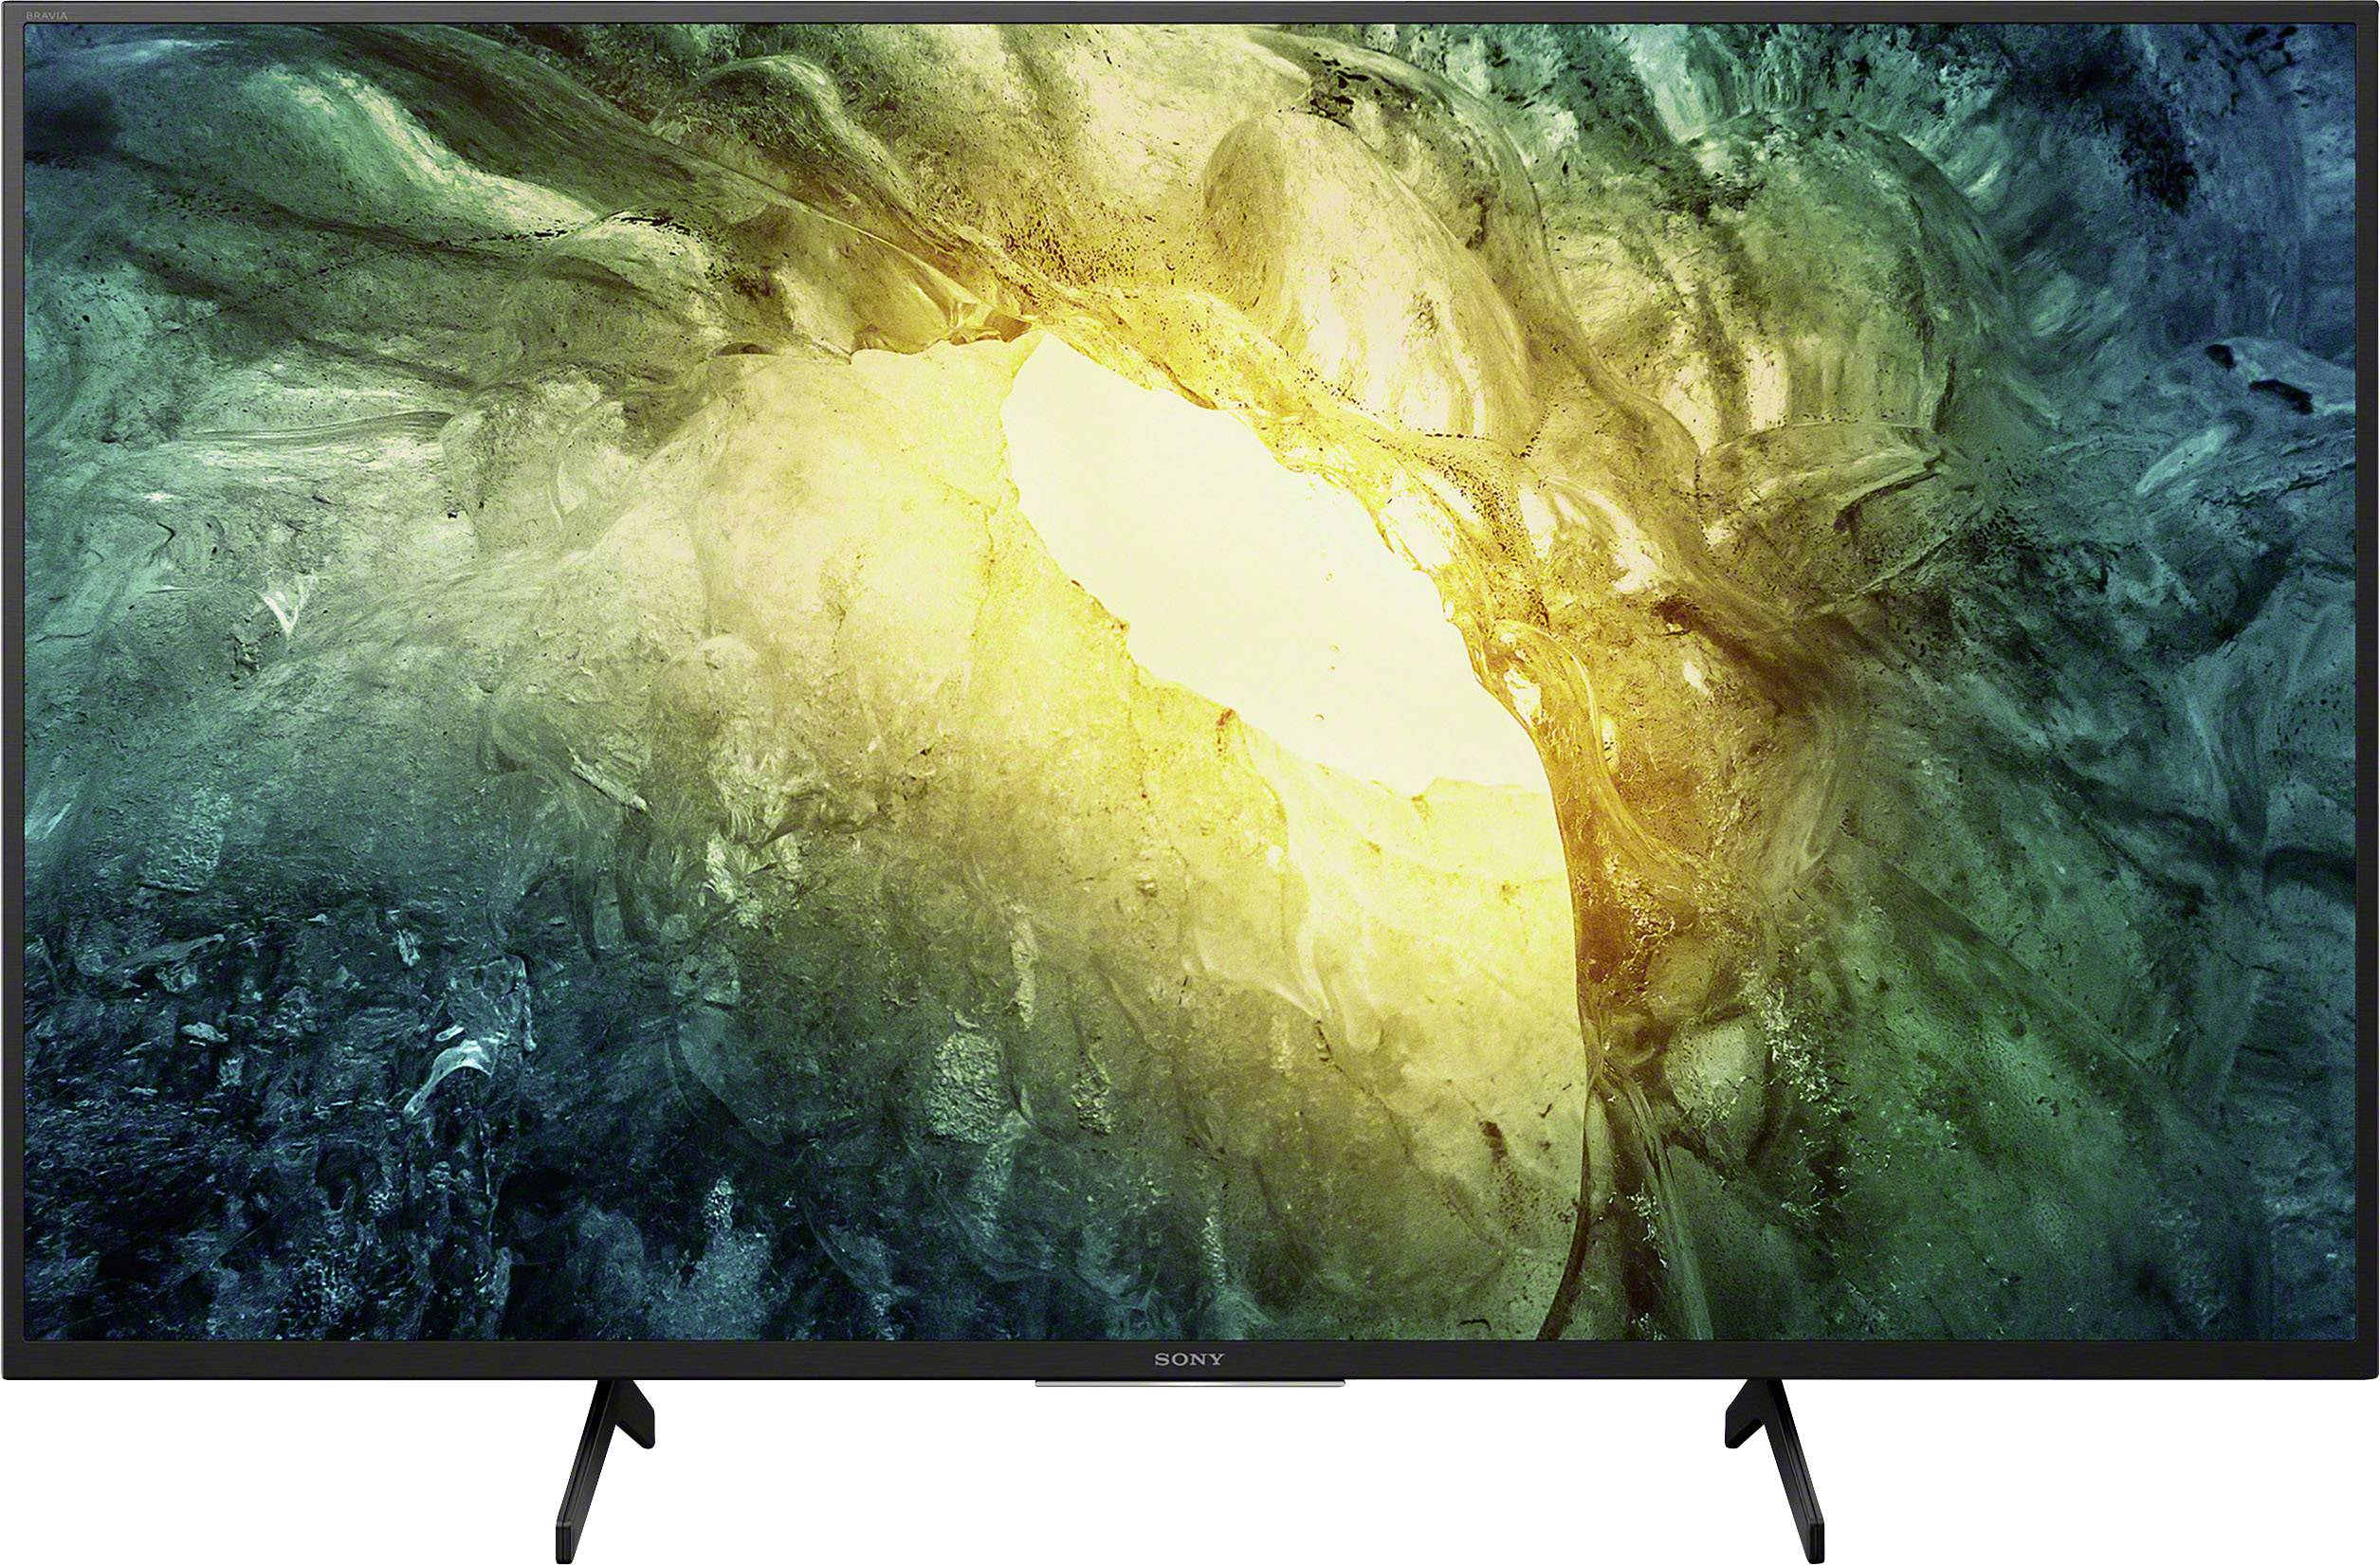 televiseur led sony kd49x7055baep 123 cm 49 pouces wi fi dvb t2 hd dvb s2 dvb c ci uhd smart tv